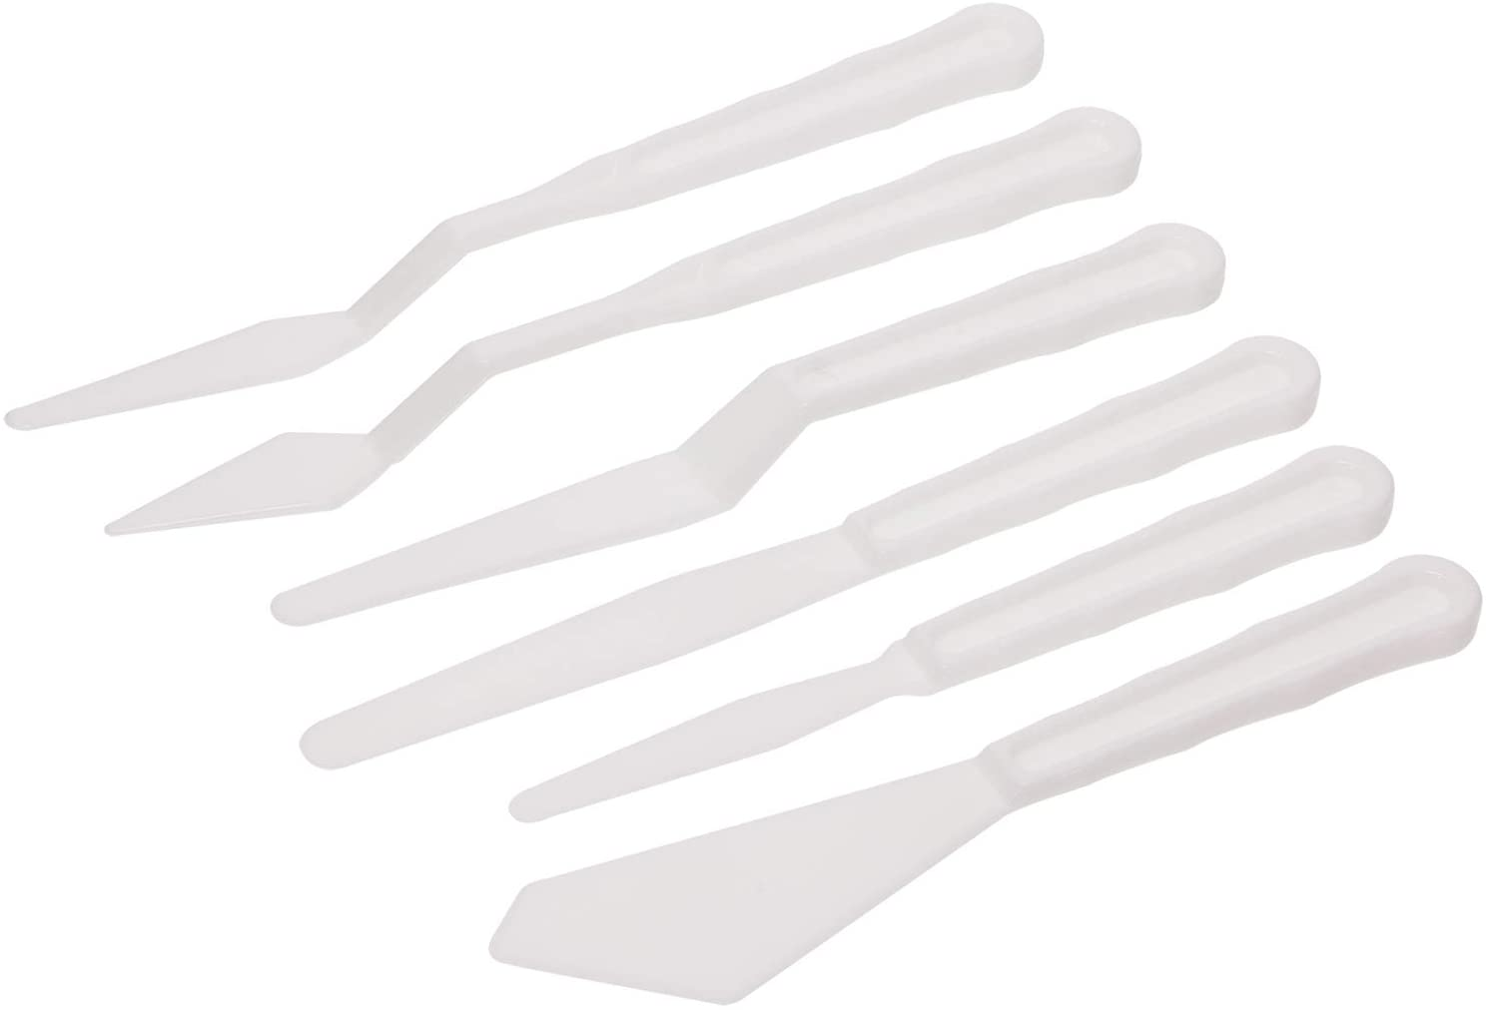 6Pcs White Art Artist Paint Spatula Tools